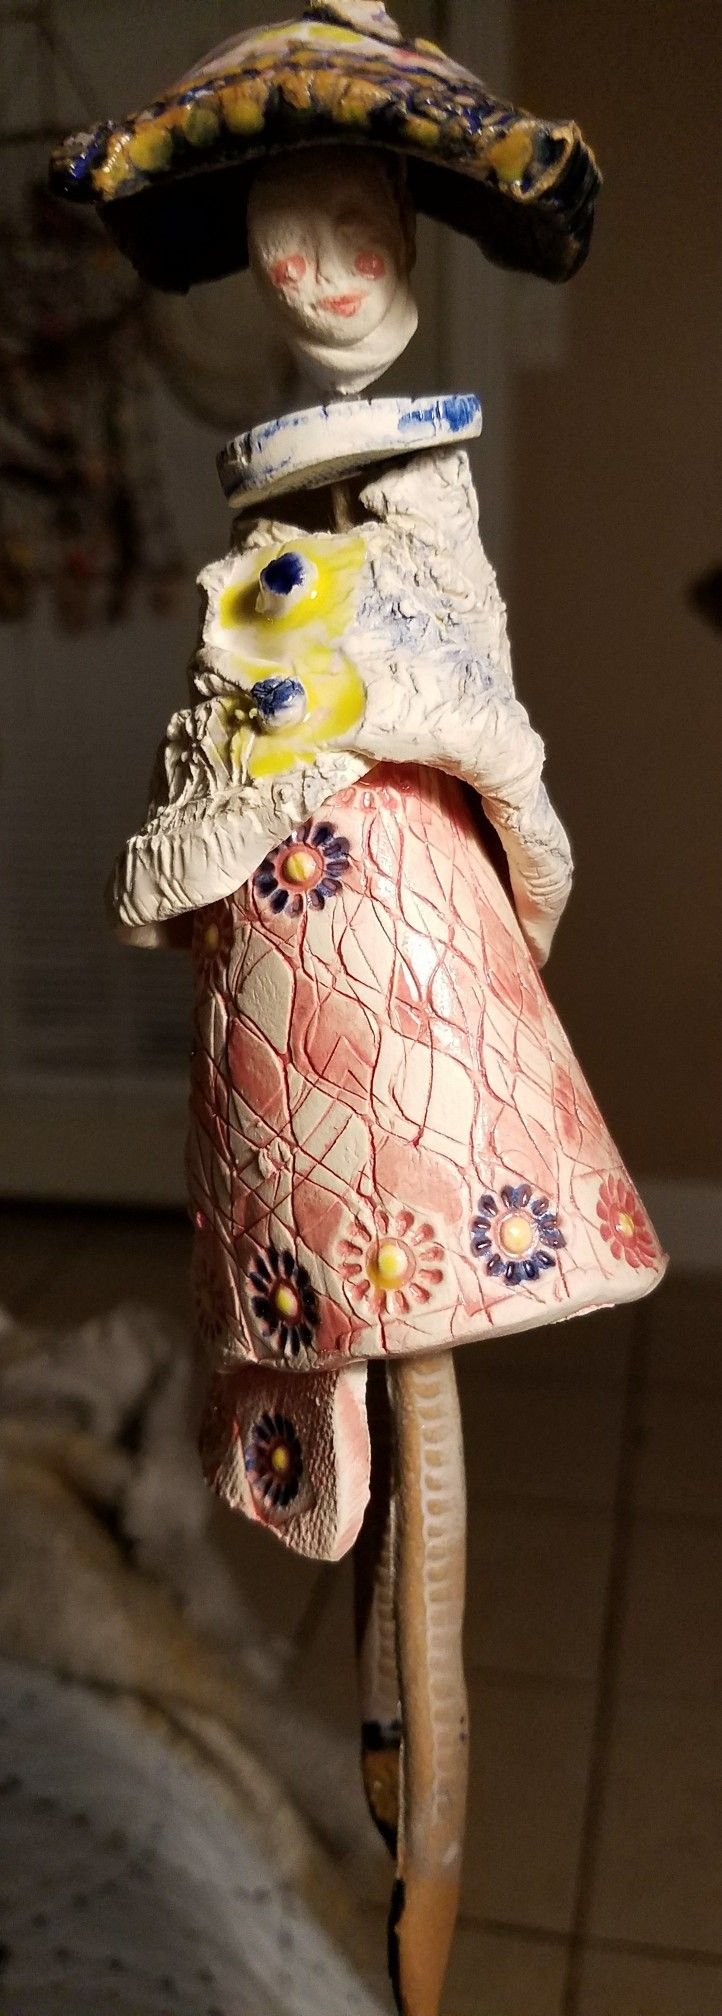 52 best rainchains images on Pinterest | Pottery ideas, Wind chimes ...